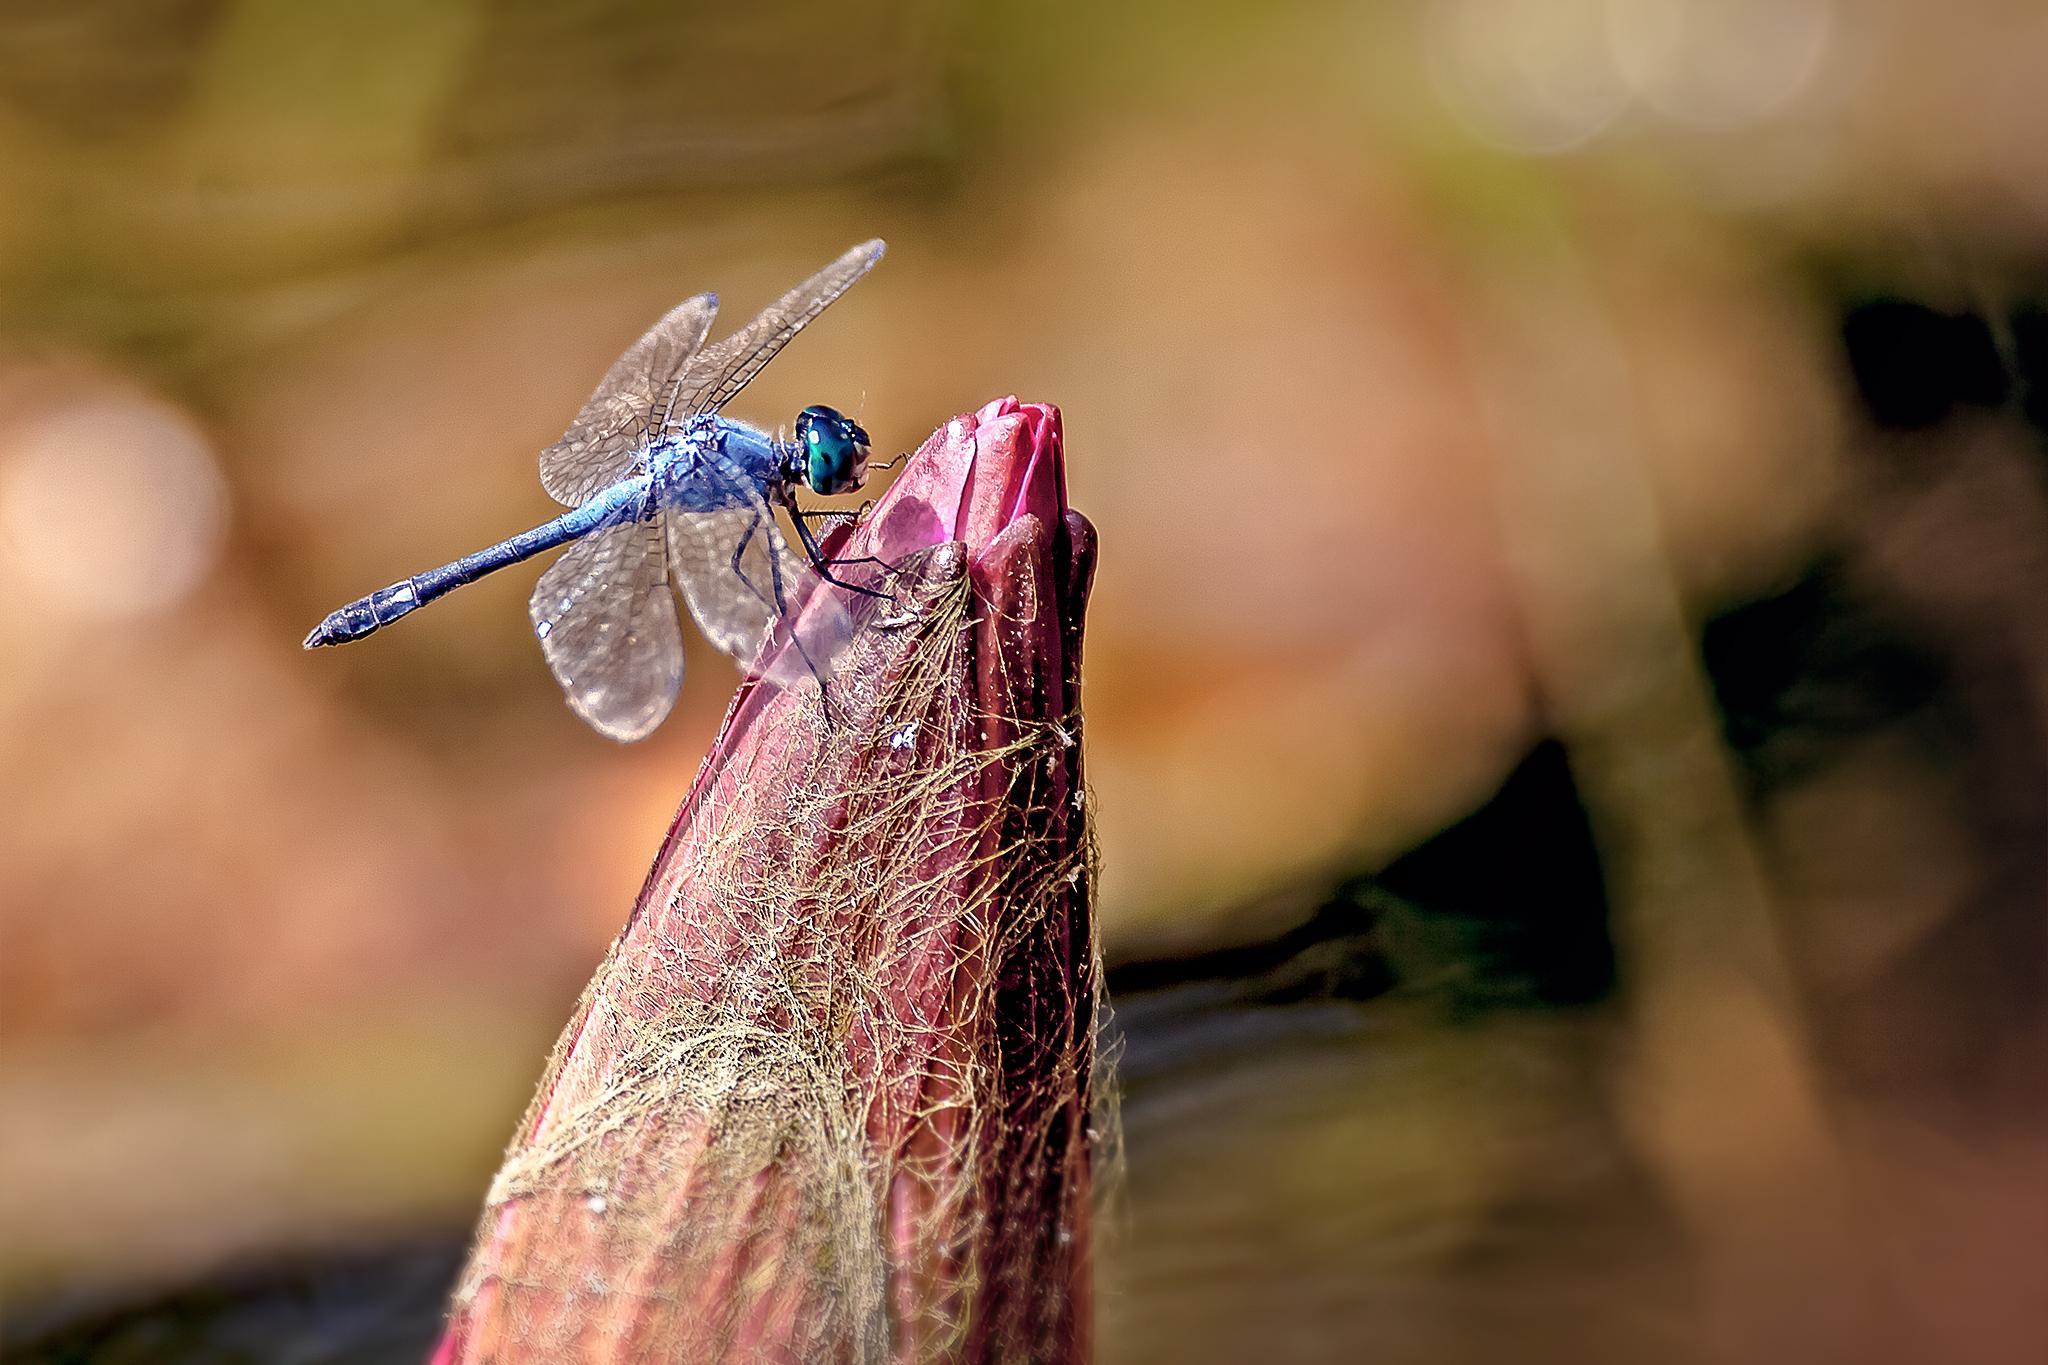 Blue dragonfly 13 by Tony Guzman